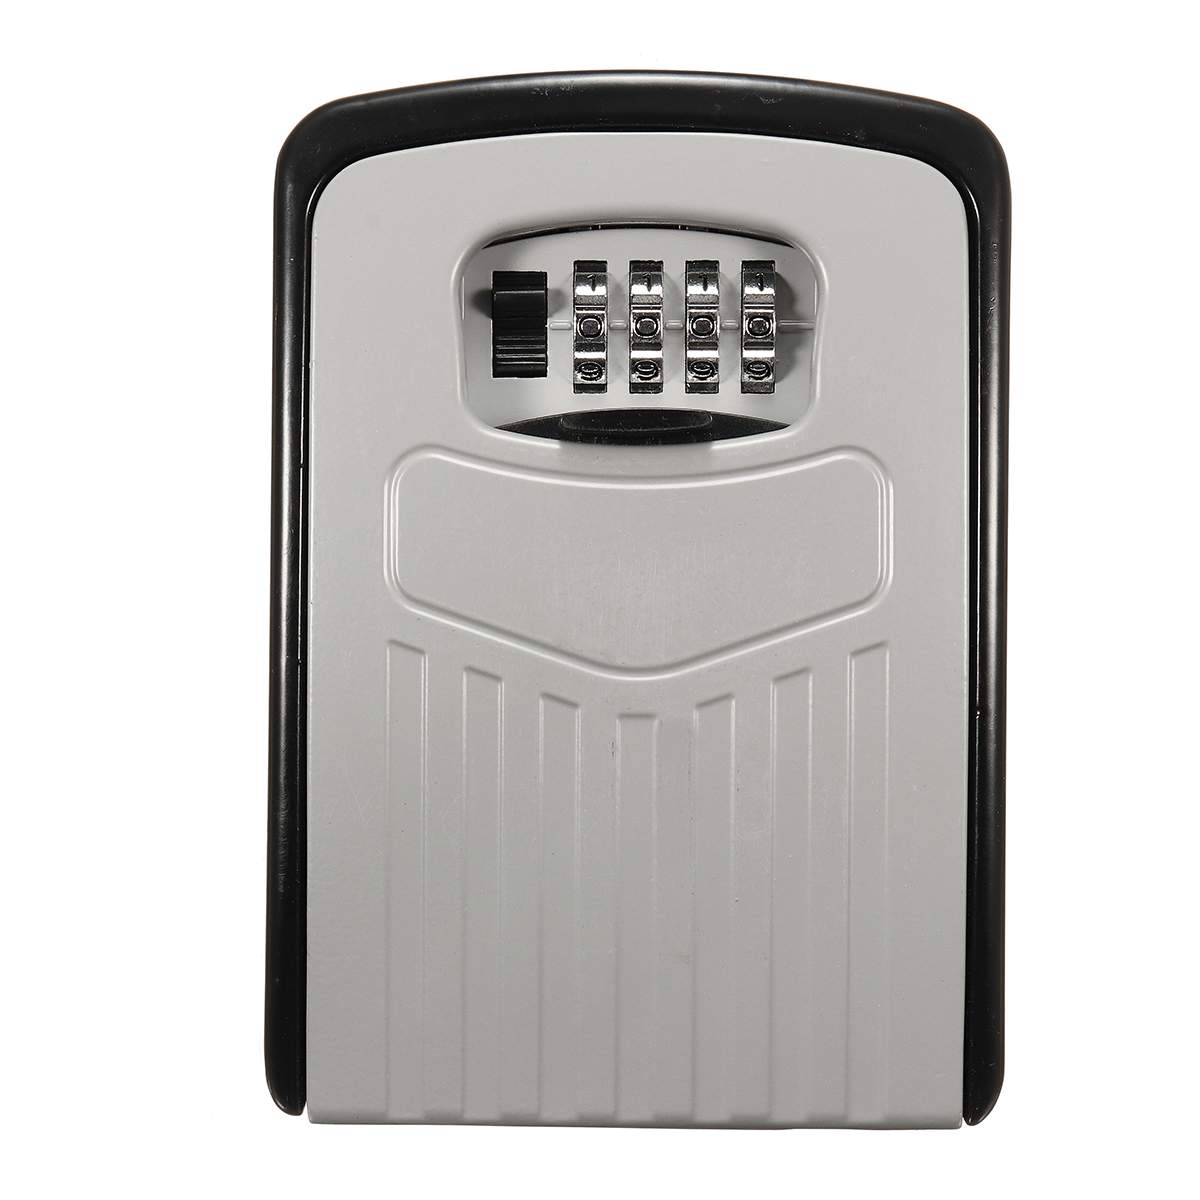 Safurance Large Key Safe Box Outdoor Key Lock Box Aluminium Wall Mounted Waterproof 4 Digit Combination Password